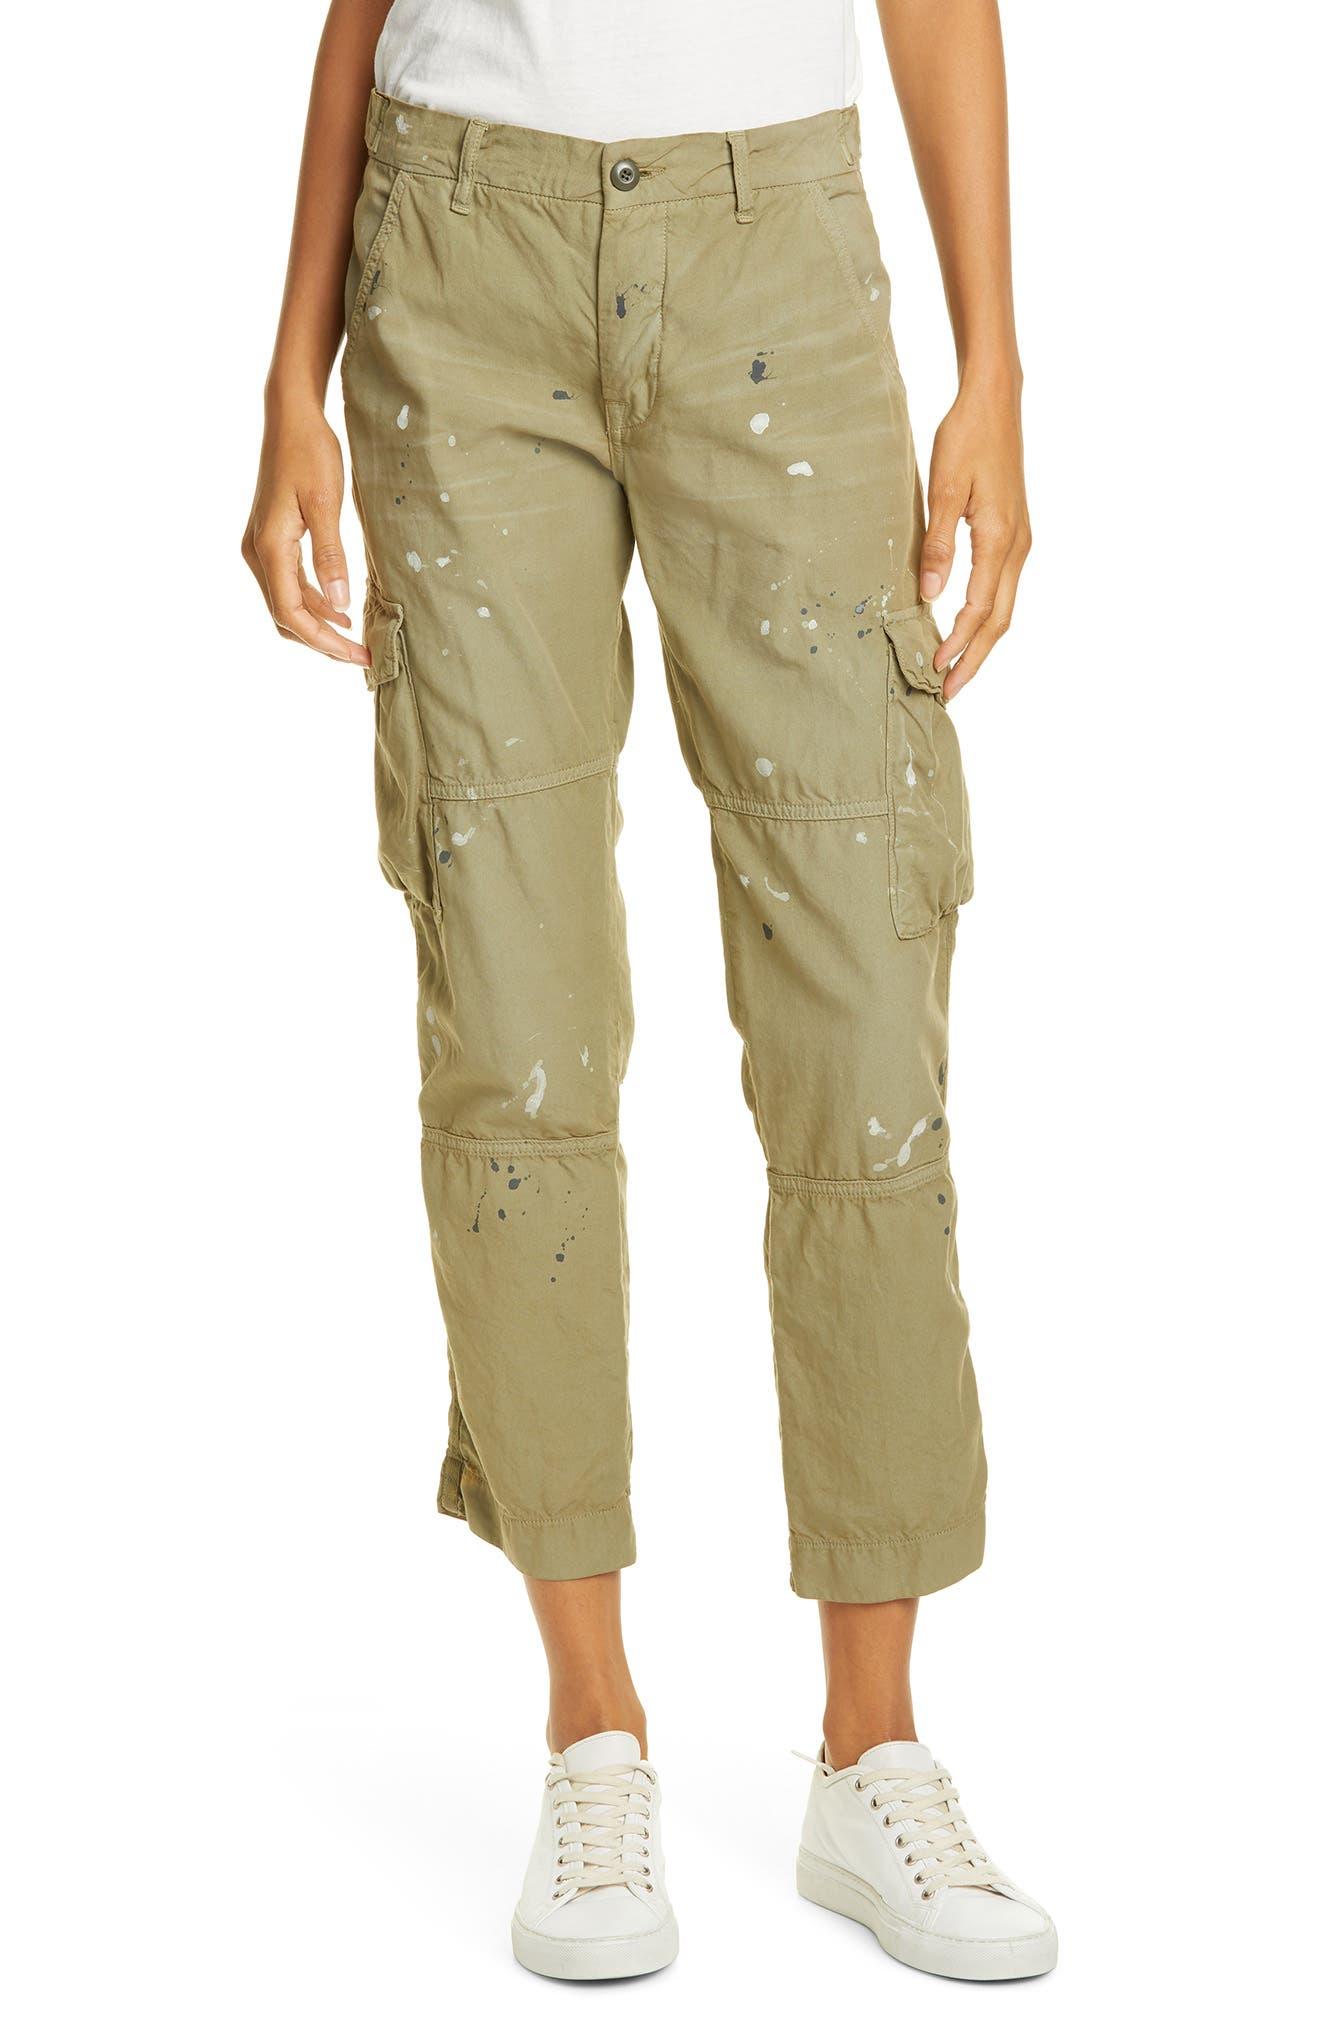 Nsf Clothing Basquiat Cargo Pants, 7 - Green